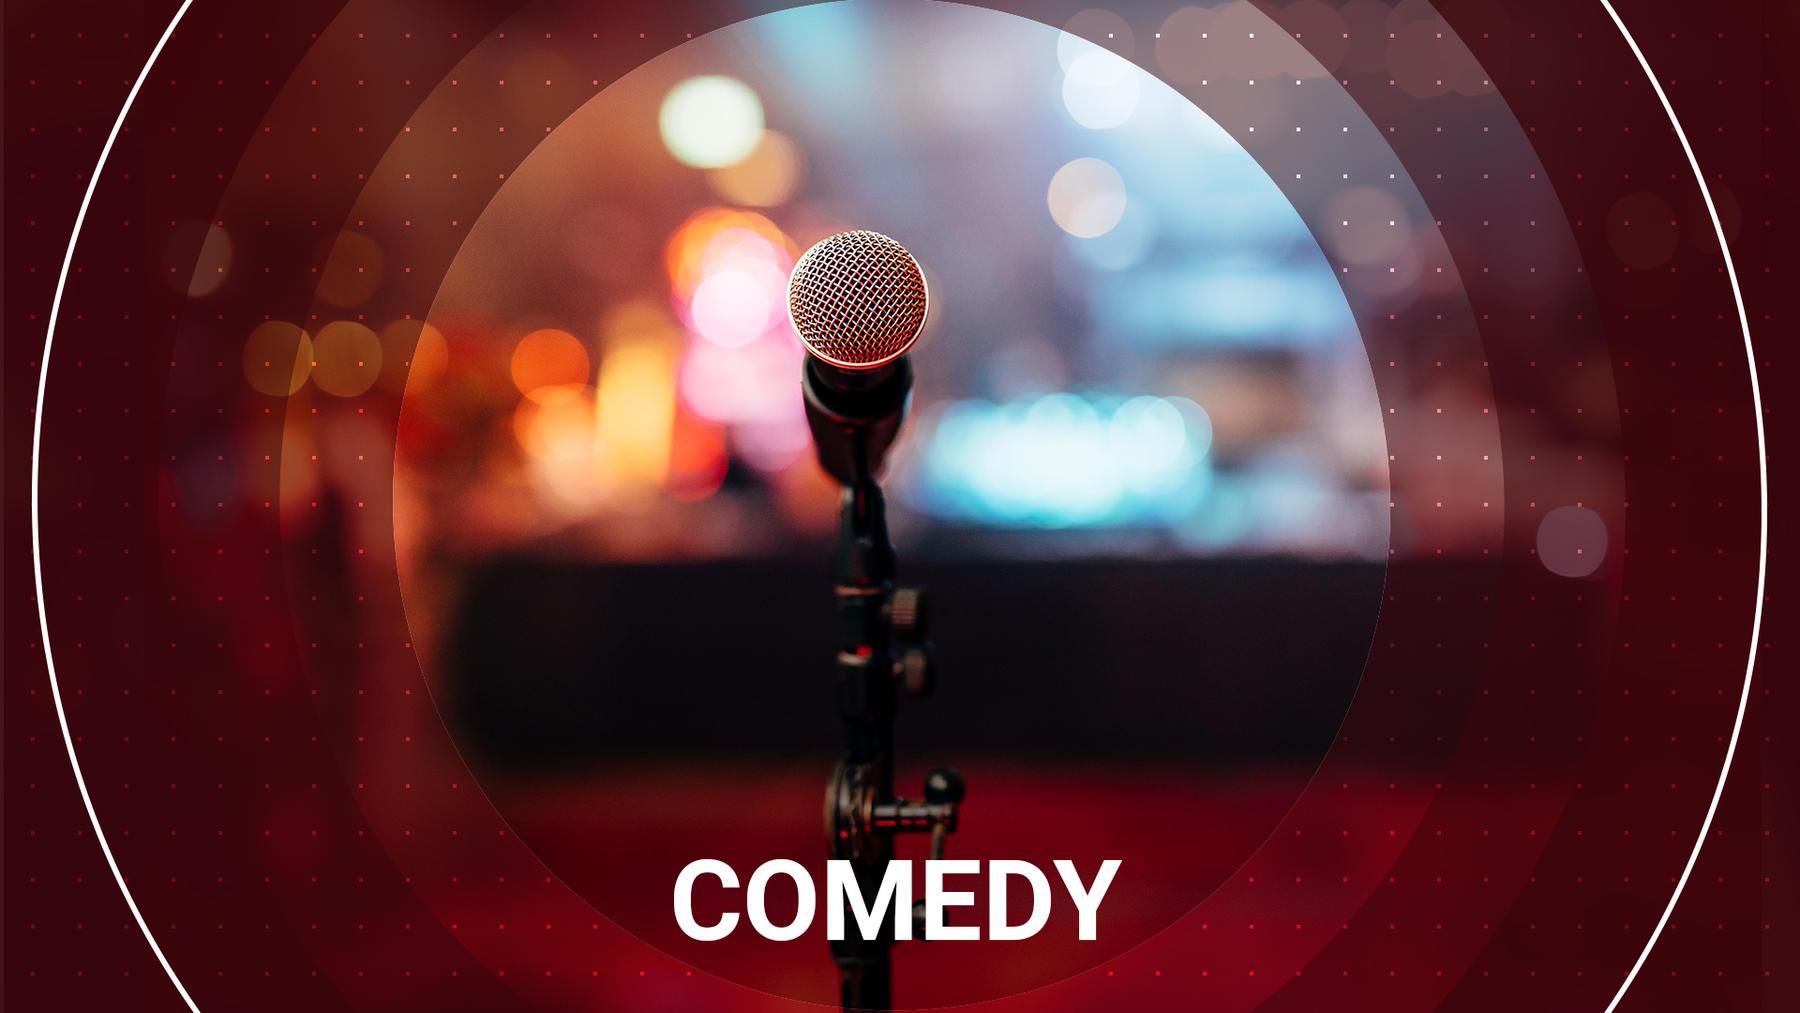 Comedy bei TVNOW